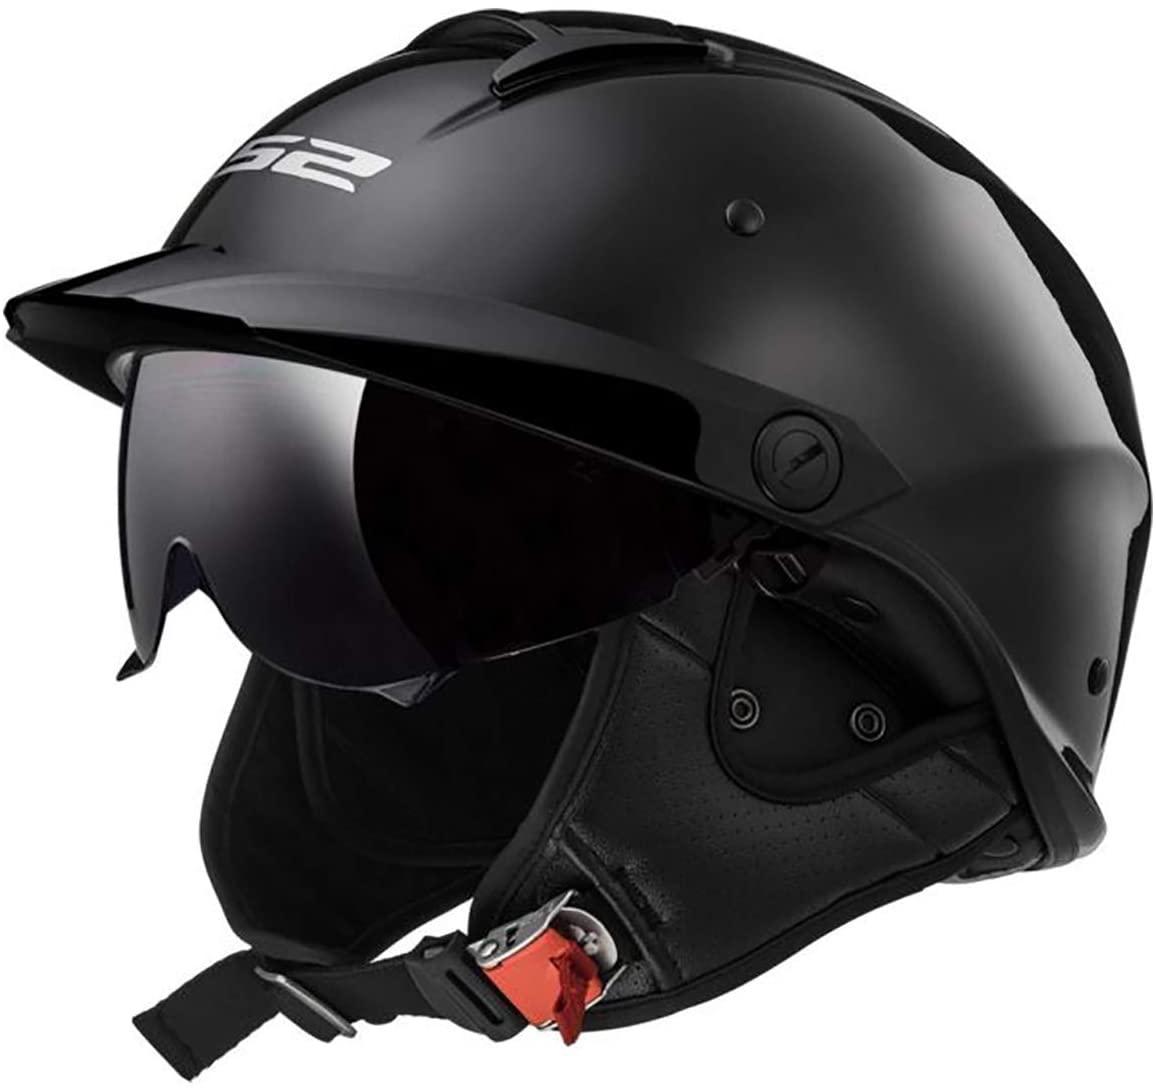 LS2 Helmets Rebellion Motorcycle Half Helmet (Gloss Black - Large)